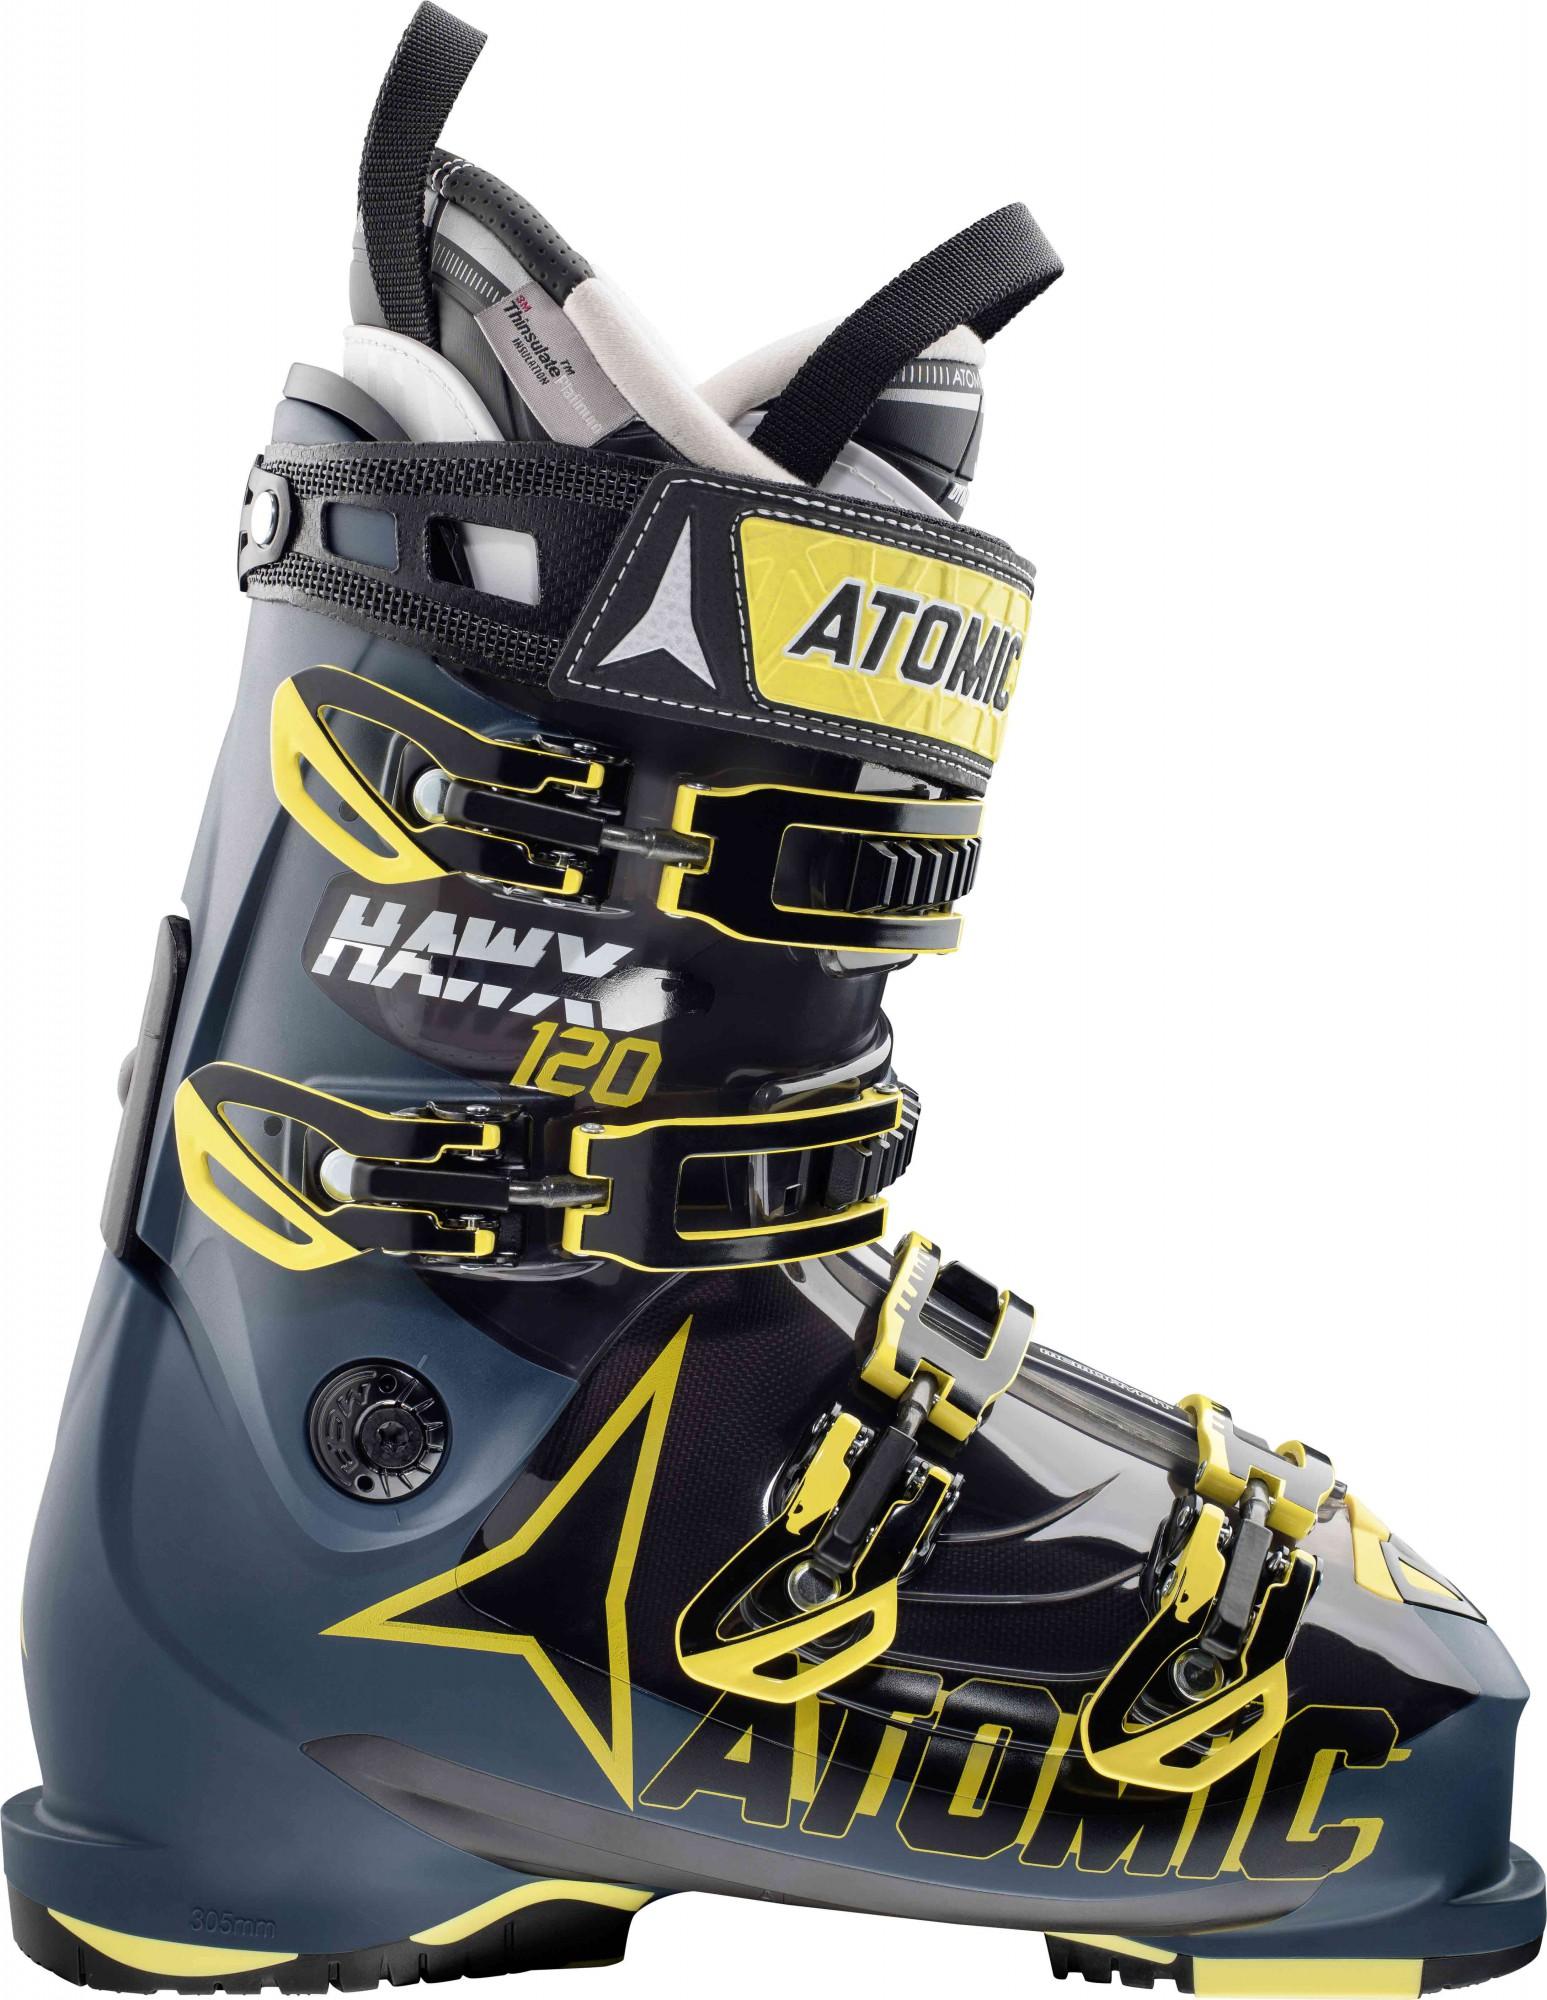 Atomic Hawx 120 - 1 Paar All Mountain Skischuhe - MP 31.5